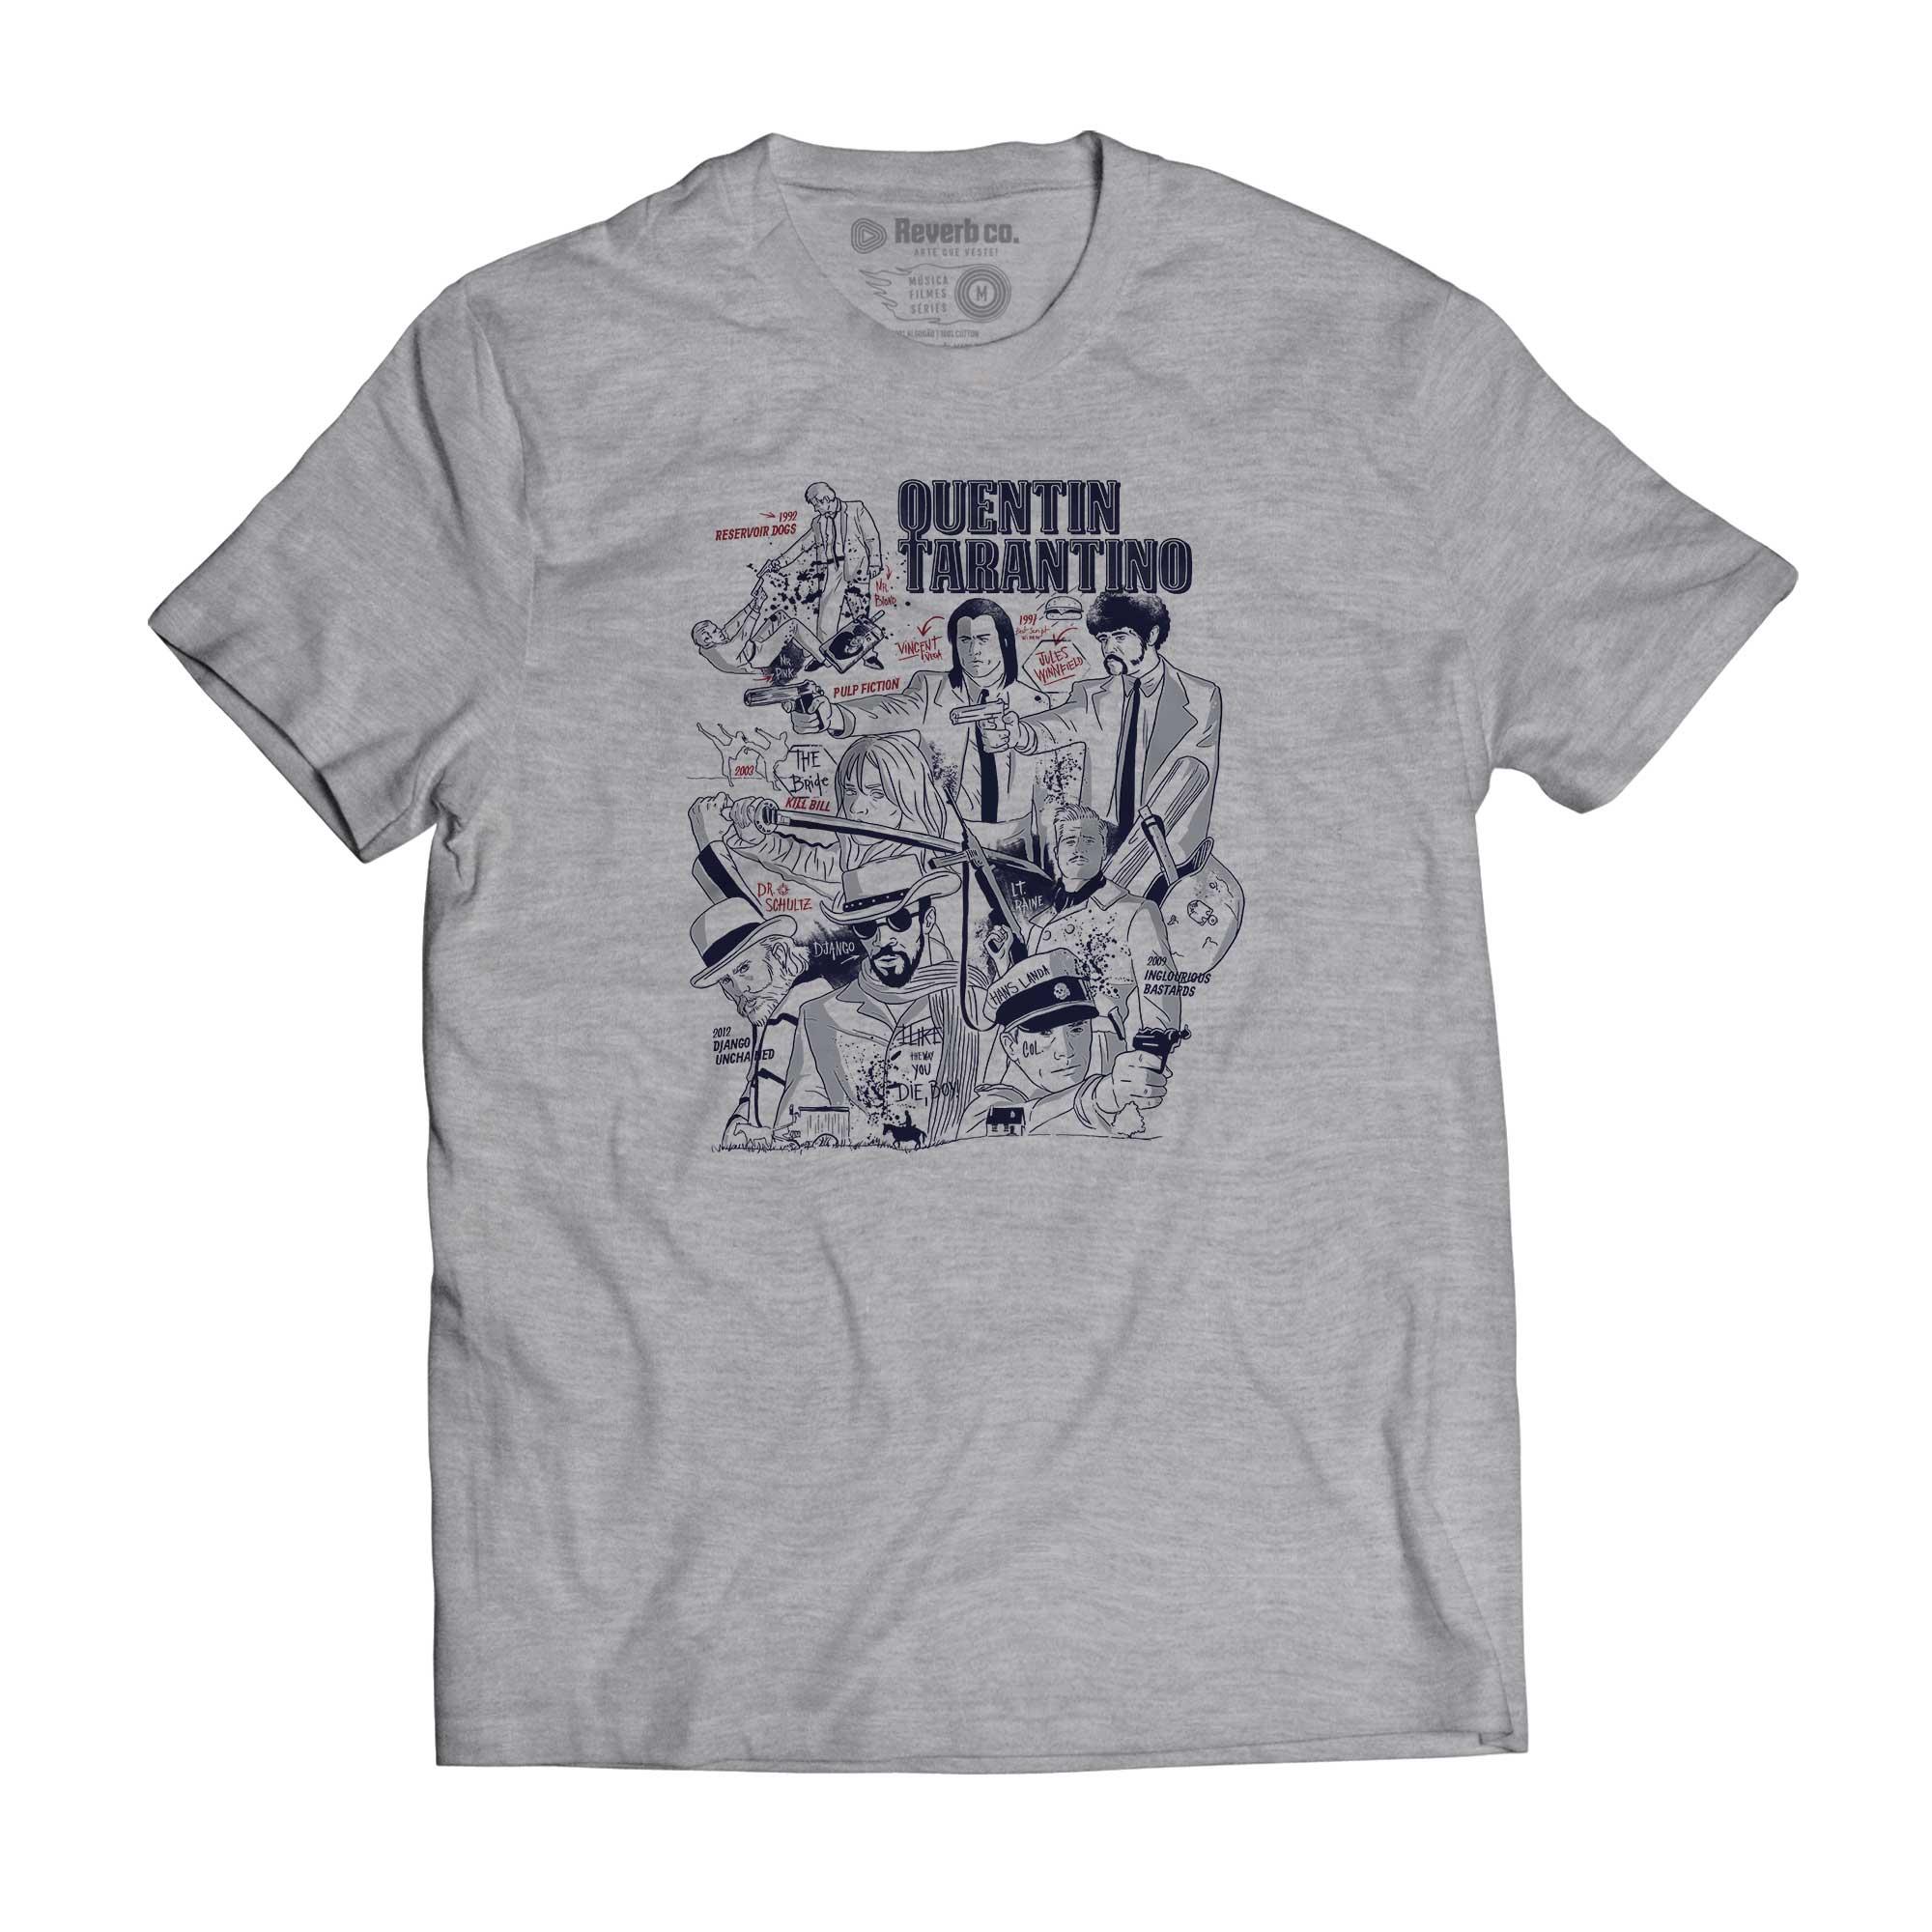 Camiseta Quentin Tarantino - Masculino